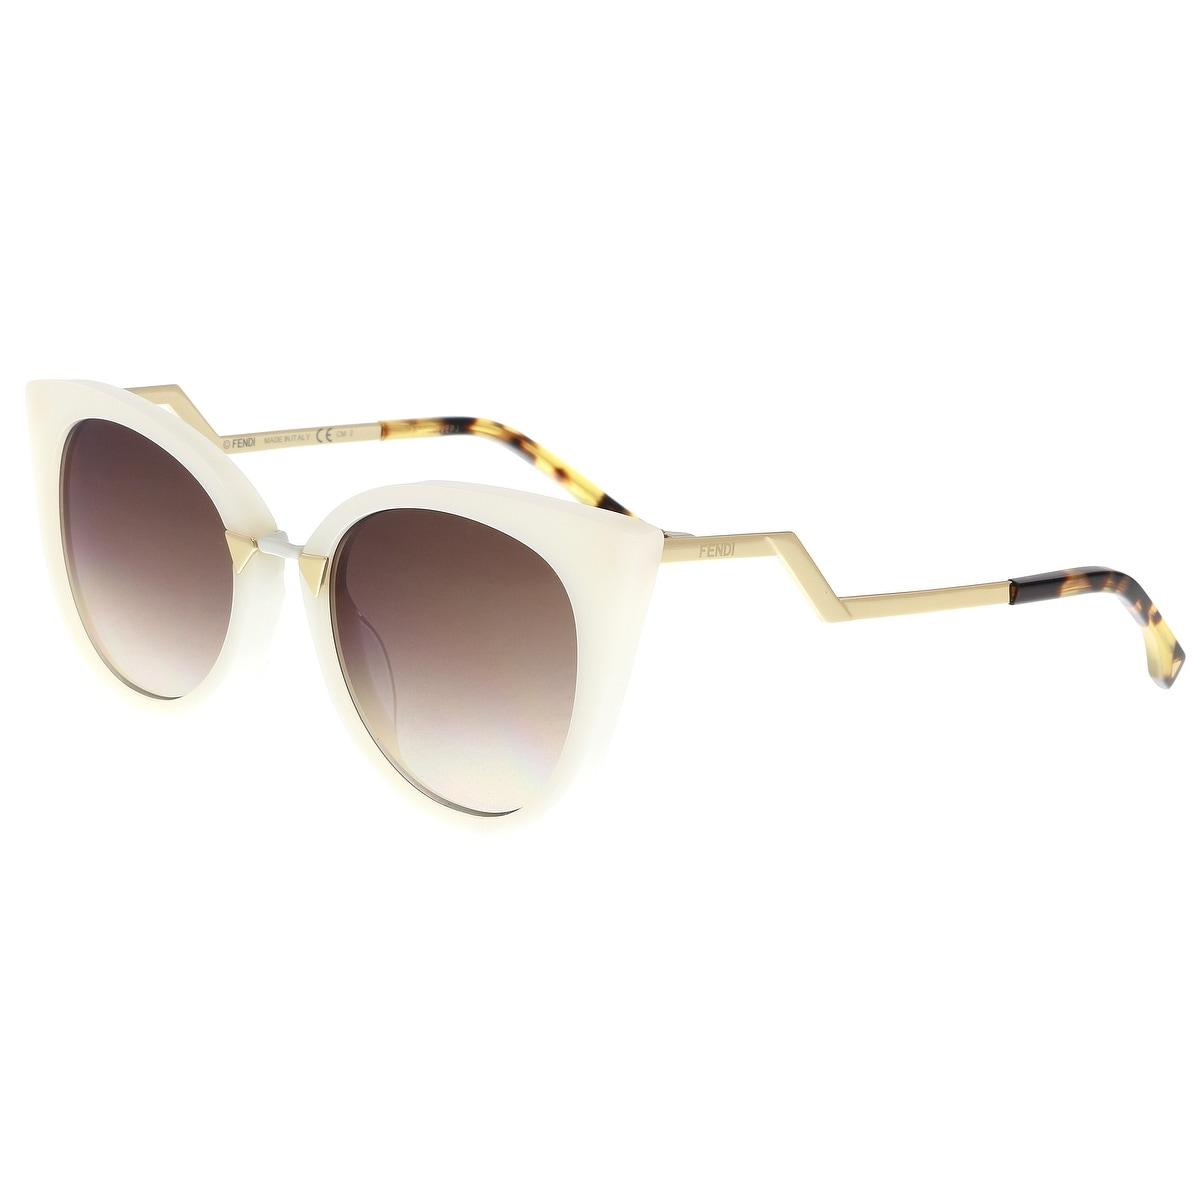 54d7b96fe790 Plastic Fendi Sunglasses   Shop our Best Clothing & Shoes Deals Online at  Overstock